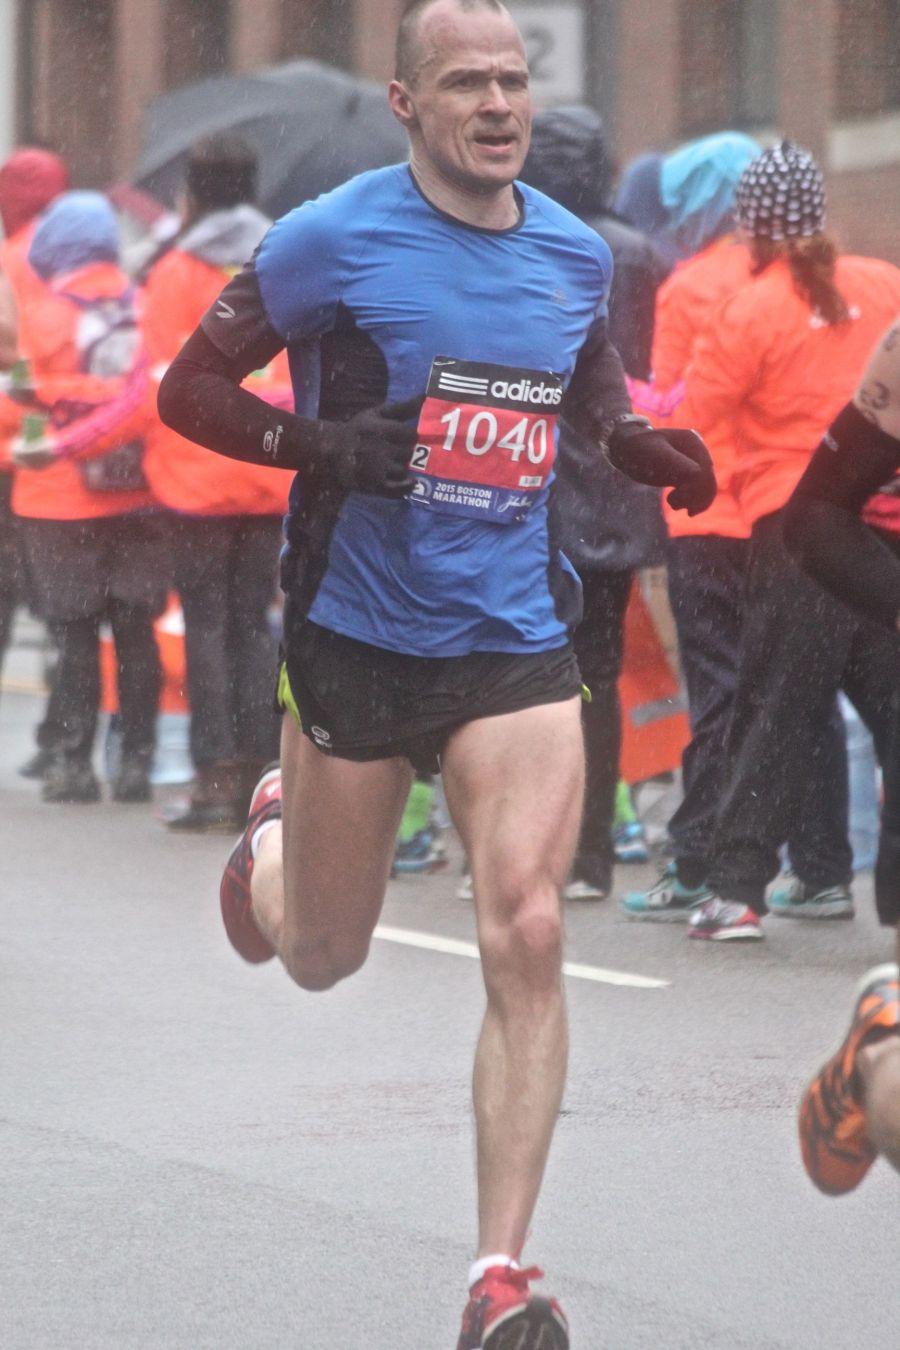 boston marathon april 20 2015 racer number 1040